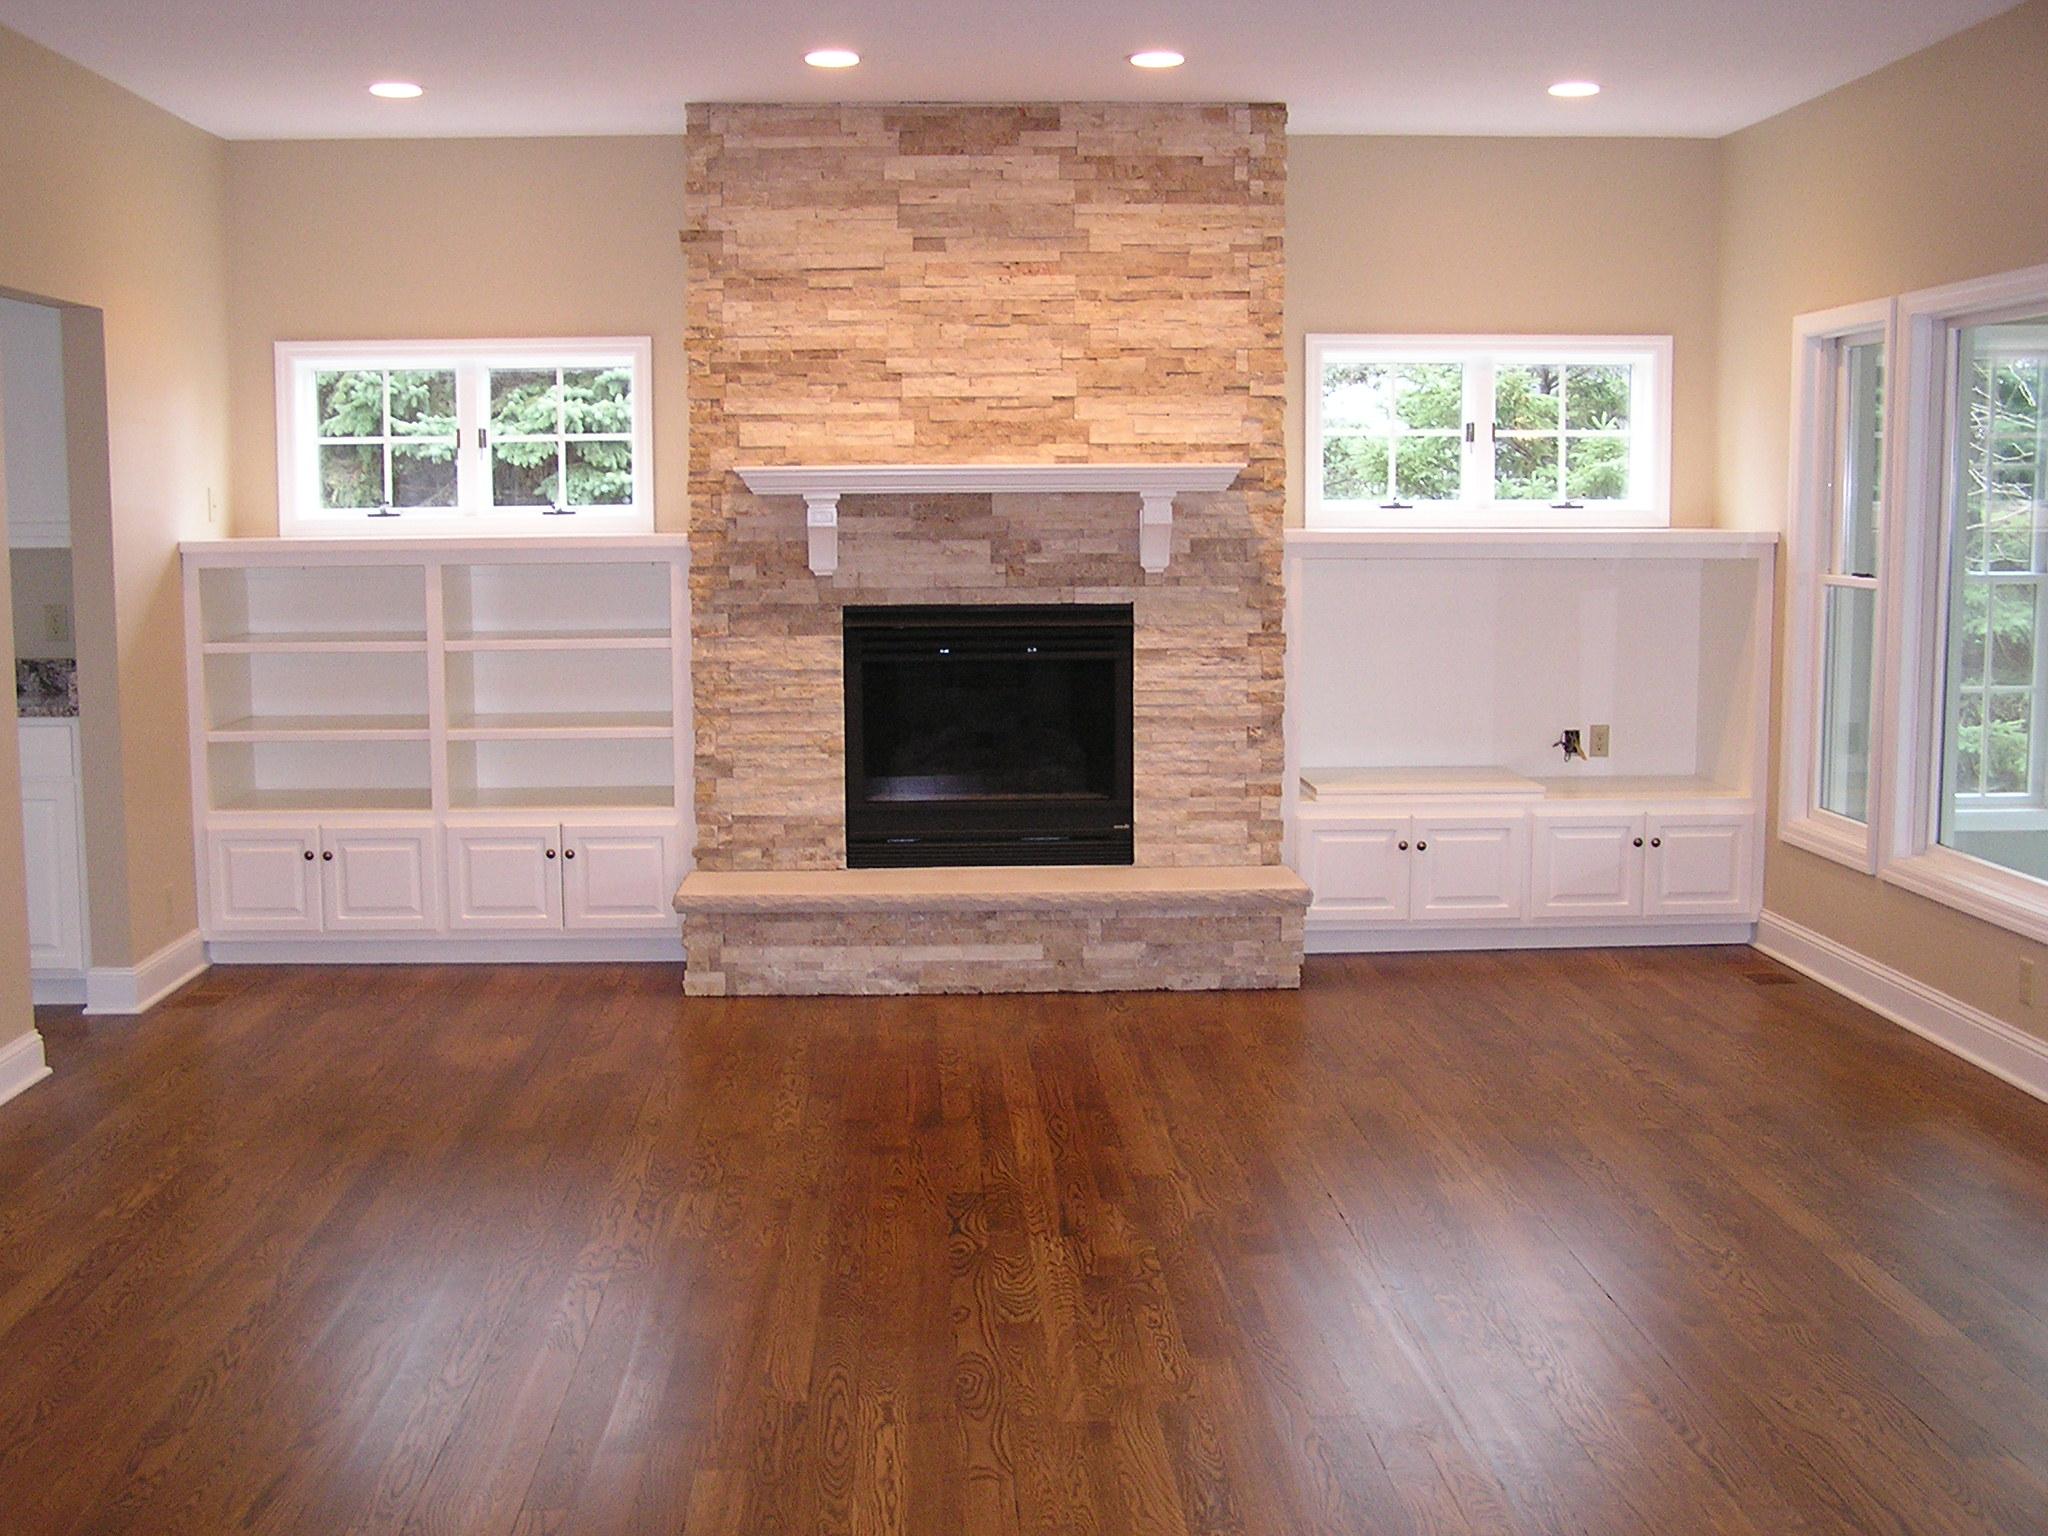 Hardwood floors and gas fireplace